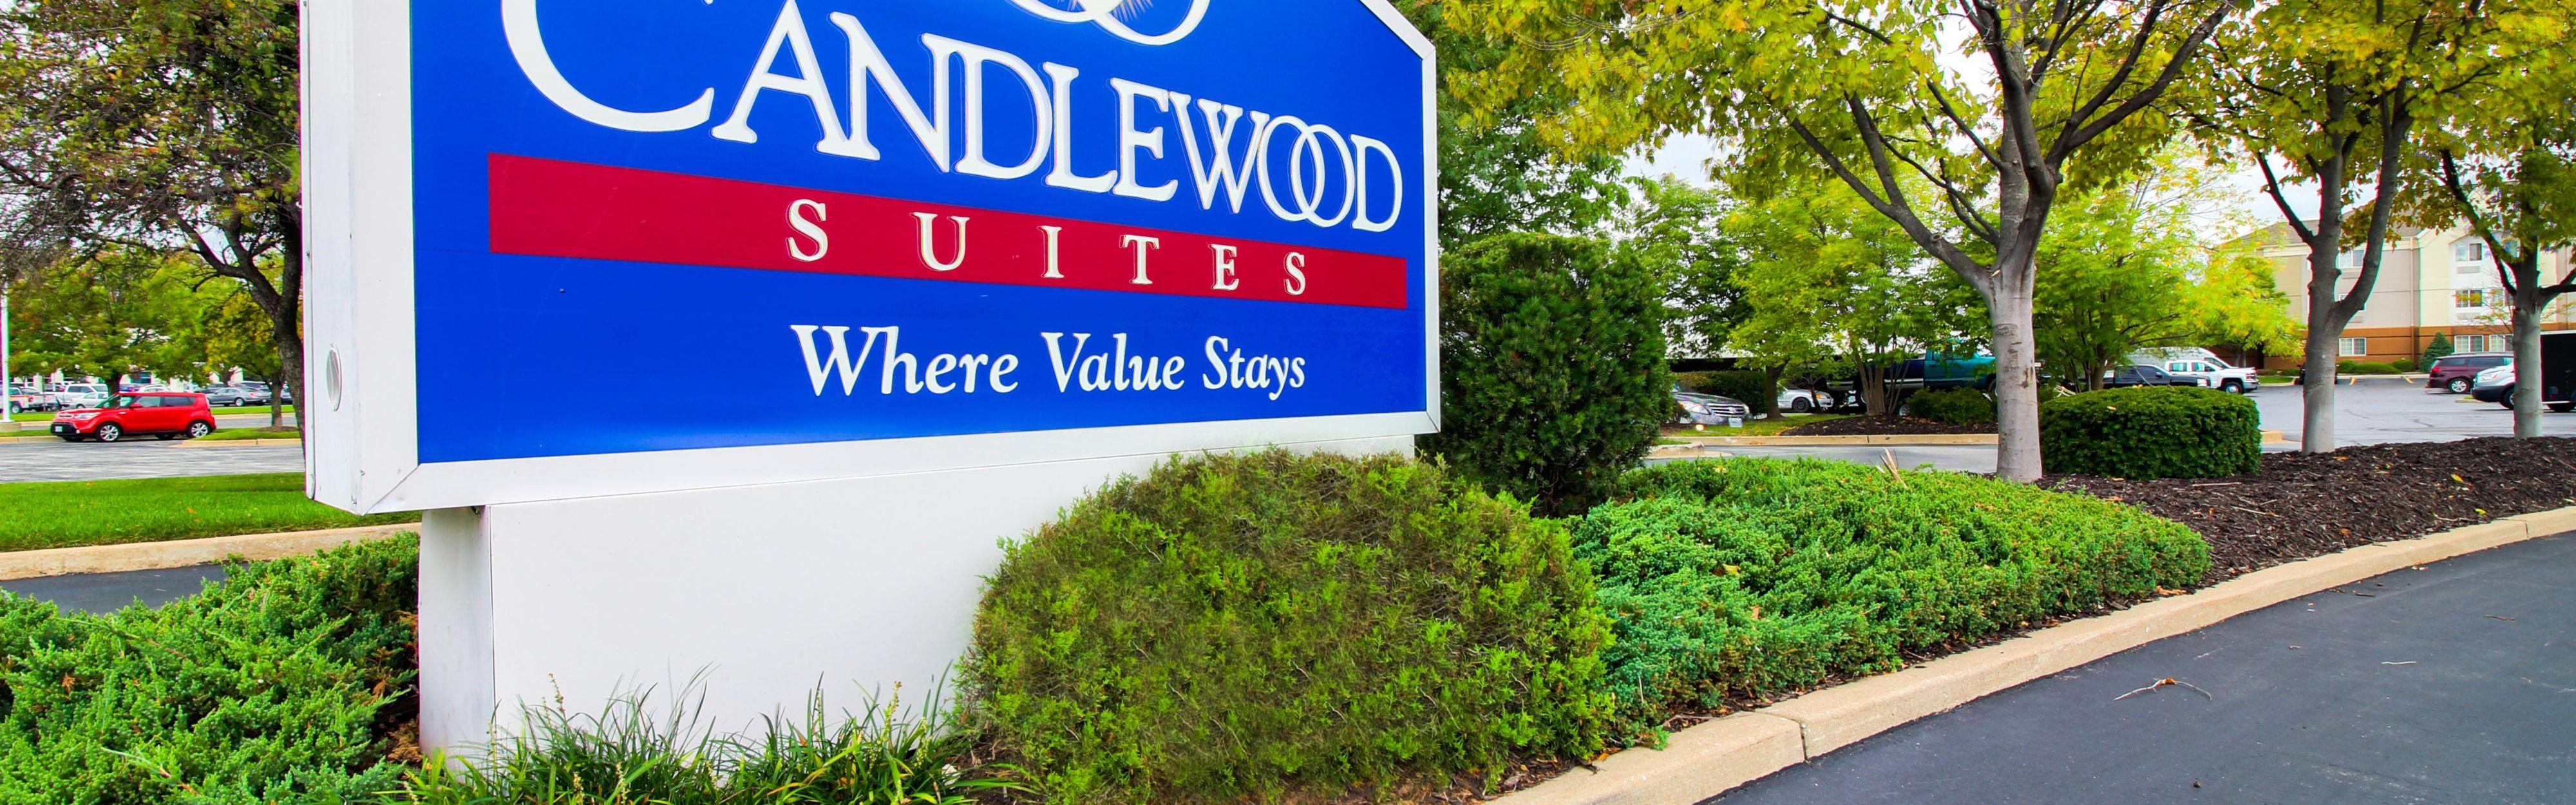 Candlewood Suites St. Louis image 0